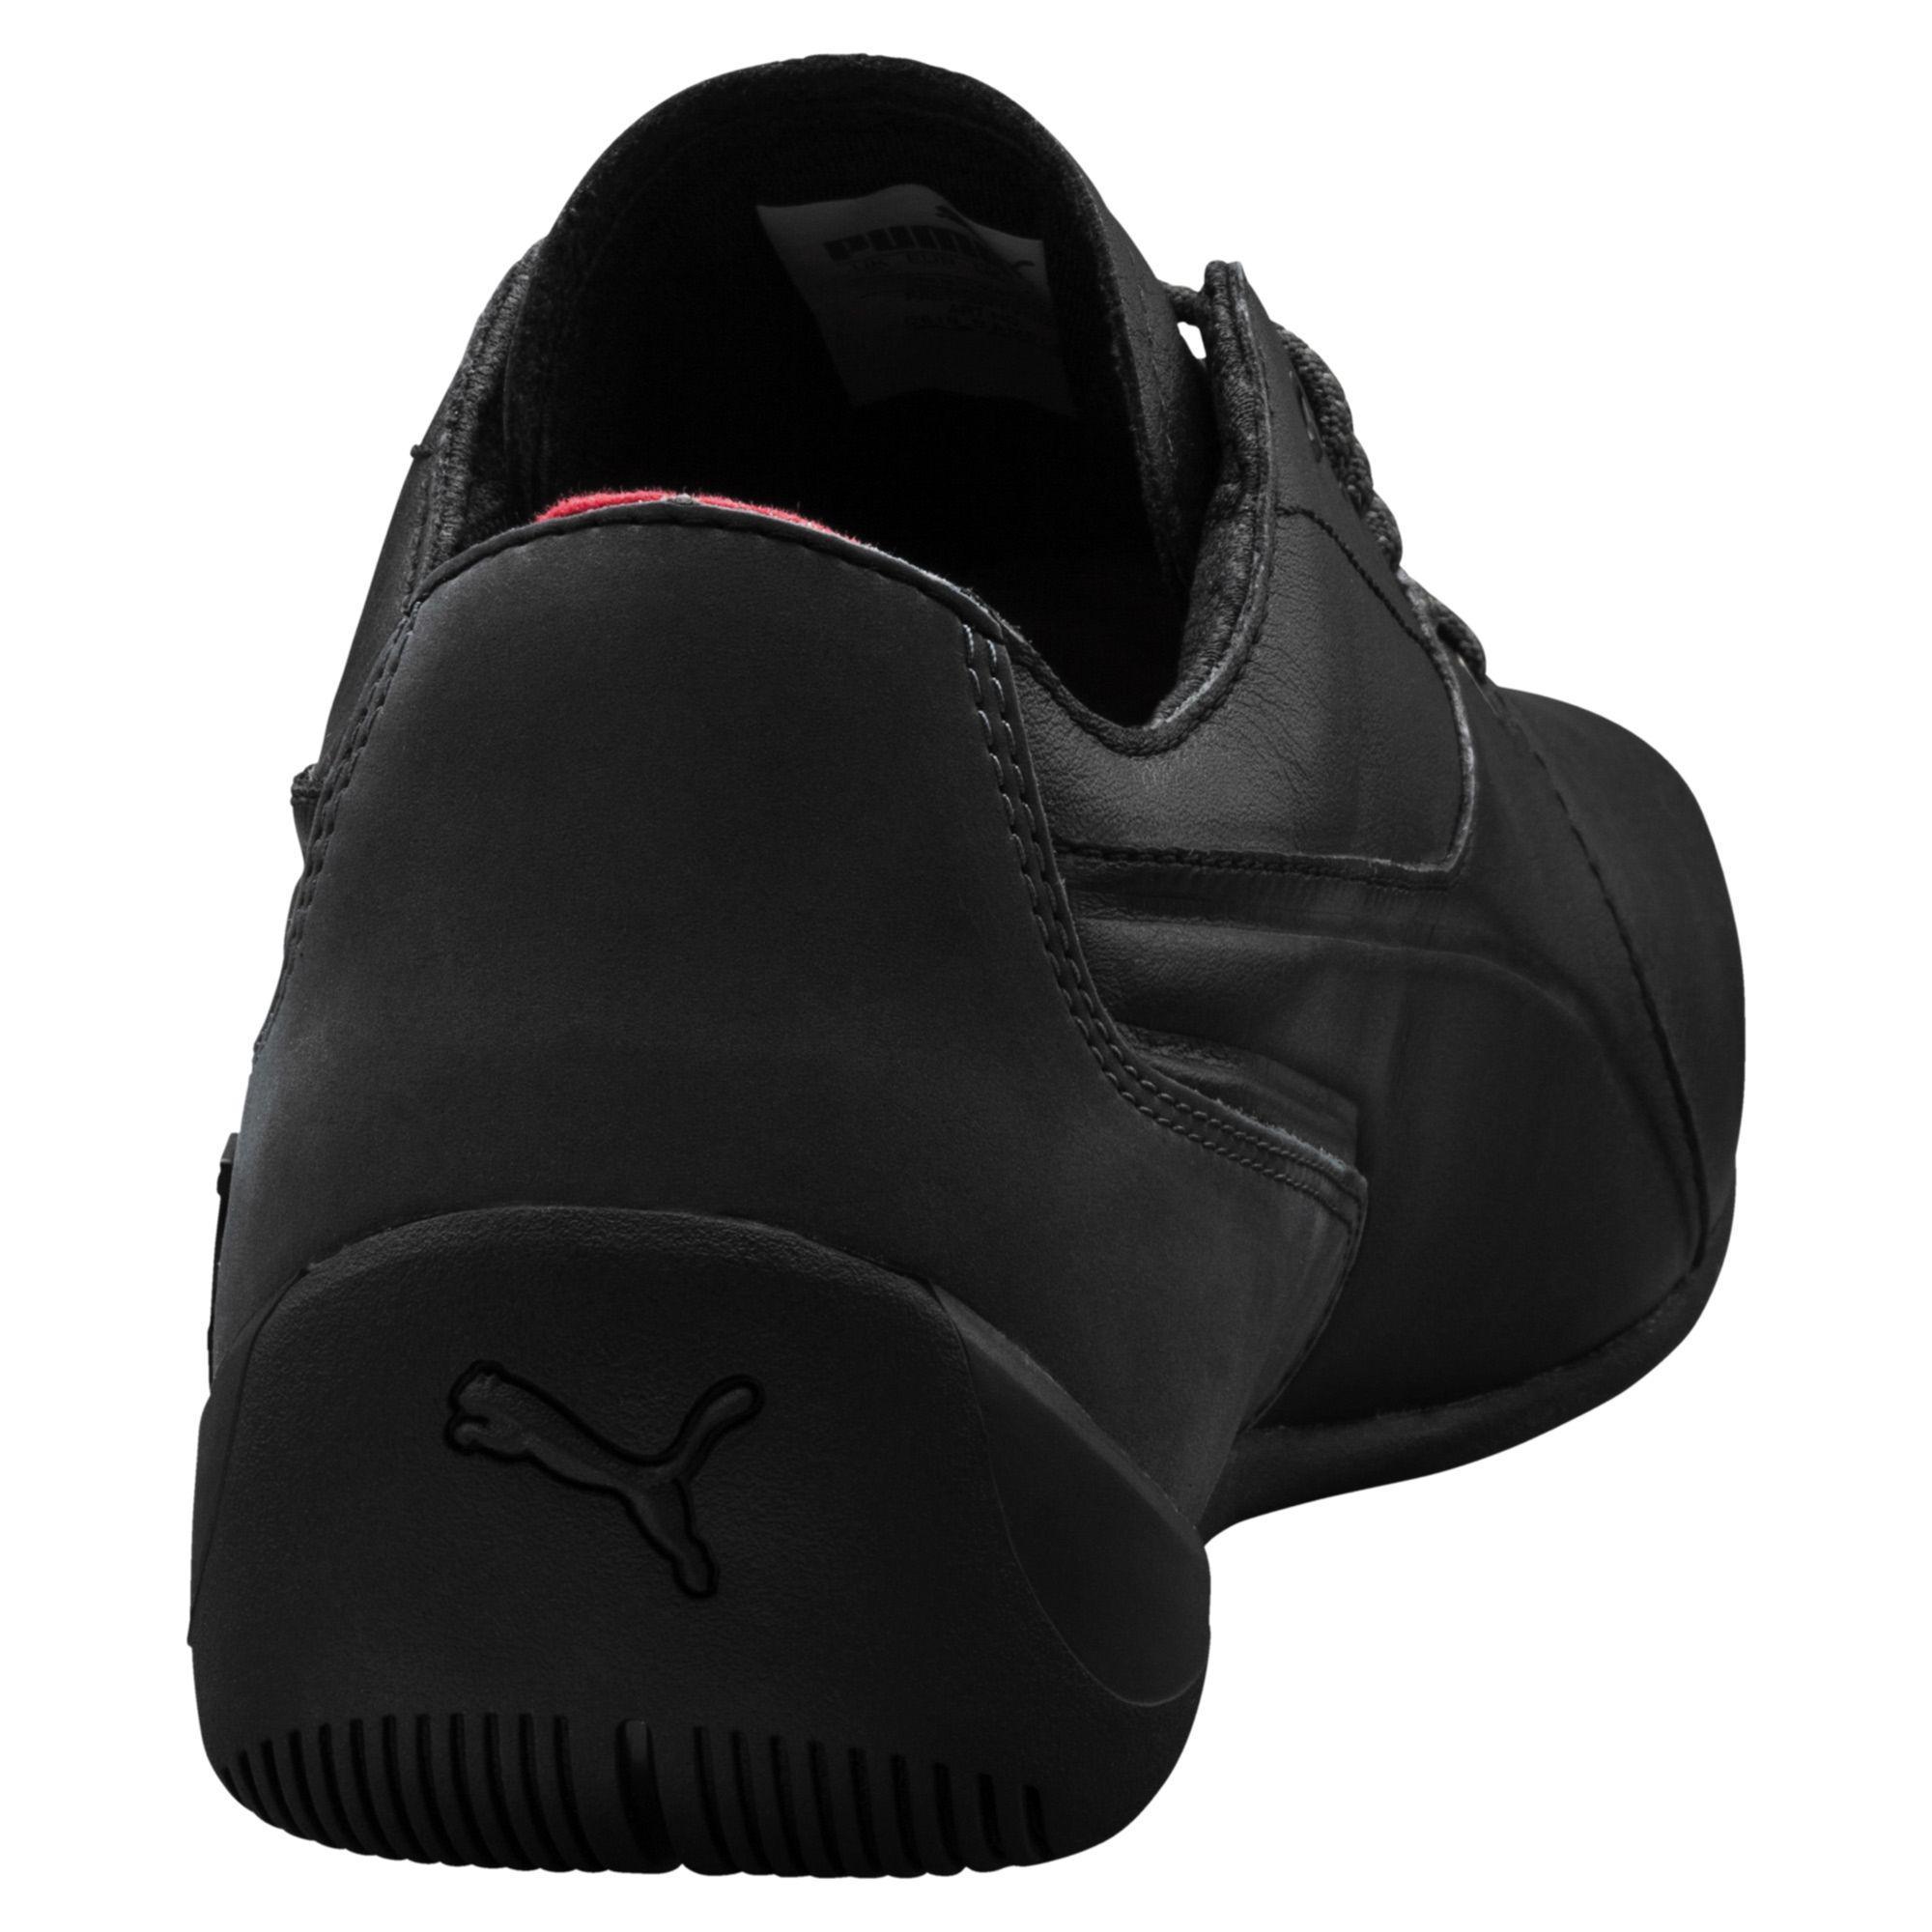 Ferrari Drift Cat 7 Lifestyle Men's Sneakers